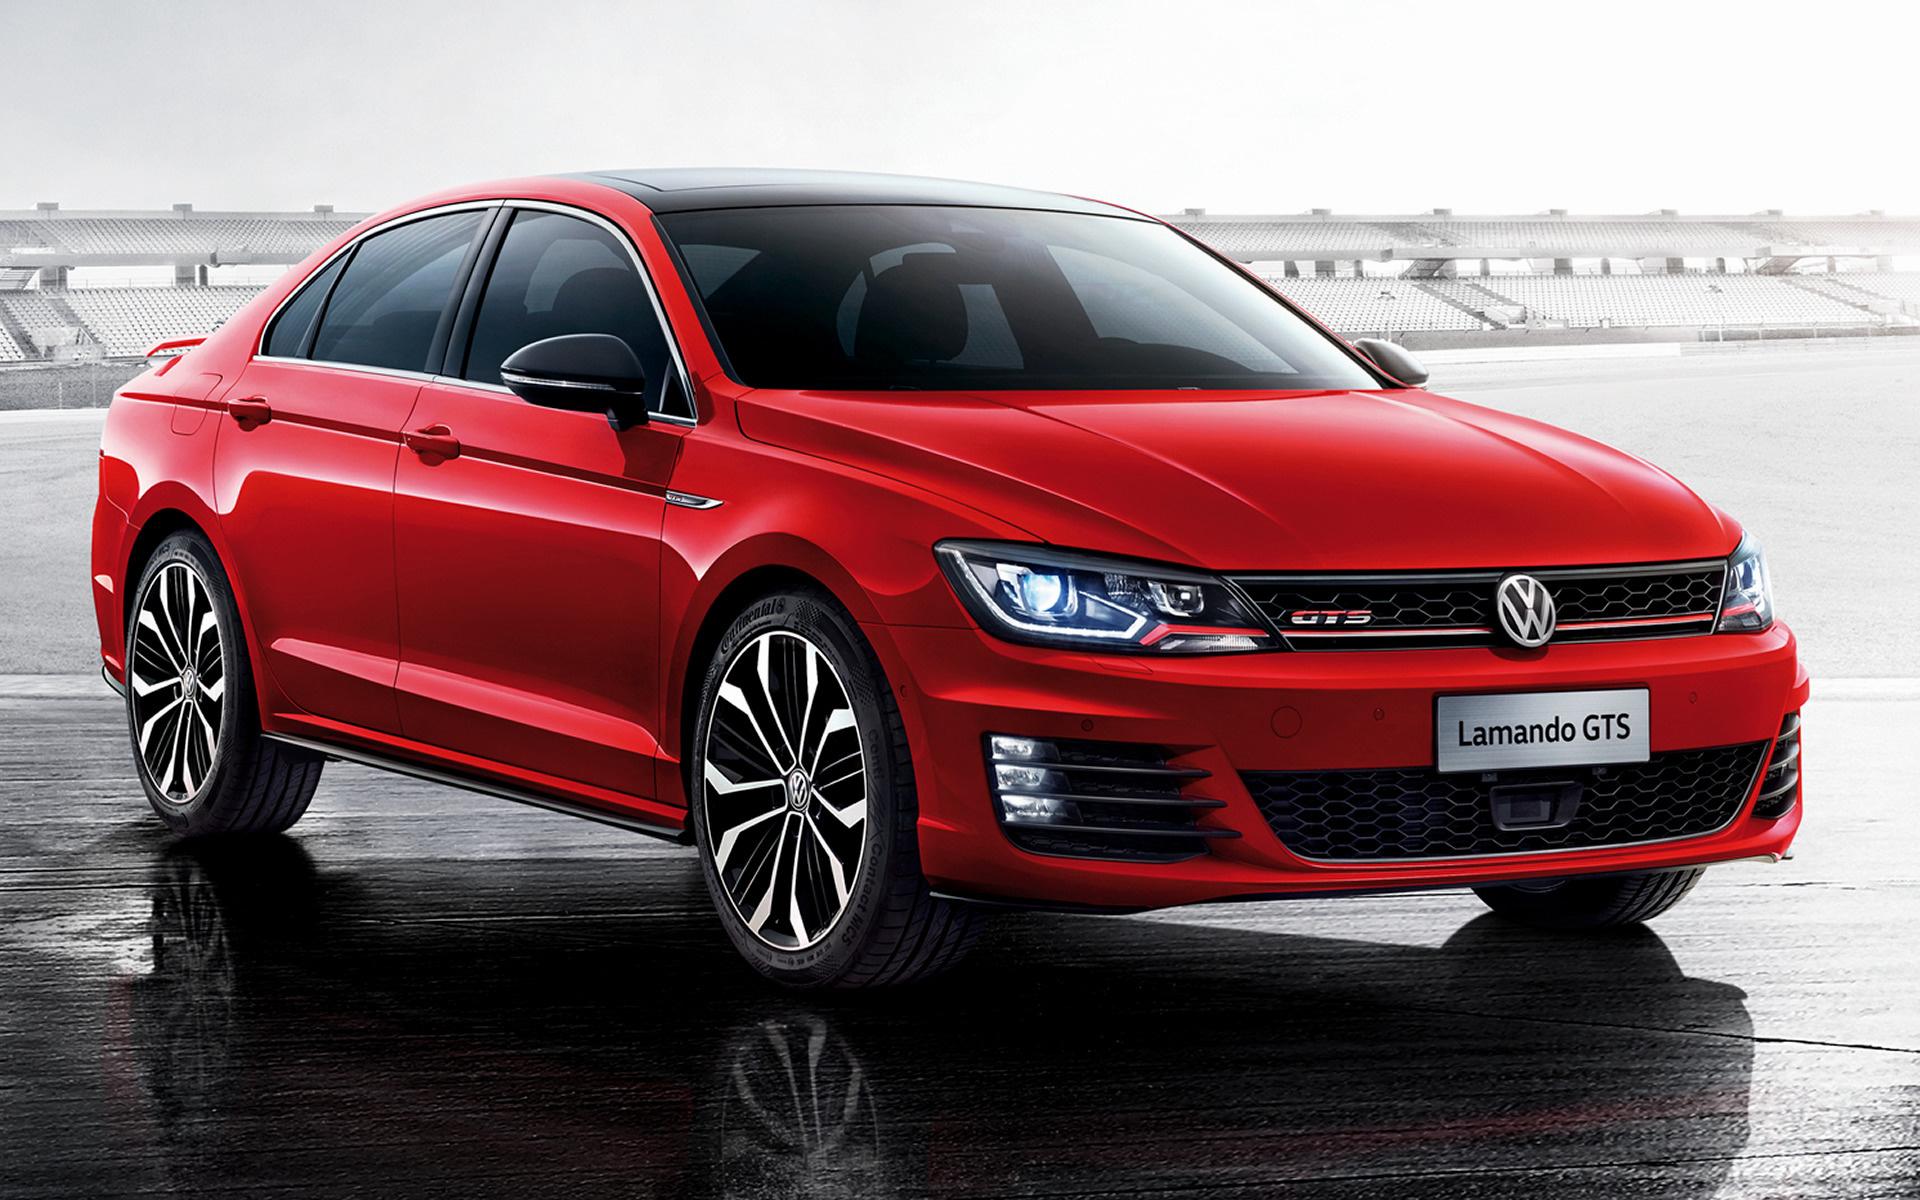 New Hyundai Genesis >> 2016 Volkswagen Lamando GTS - Wallpapers and HD Images